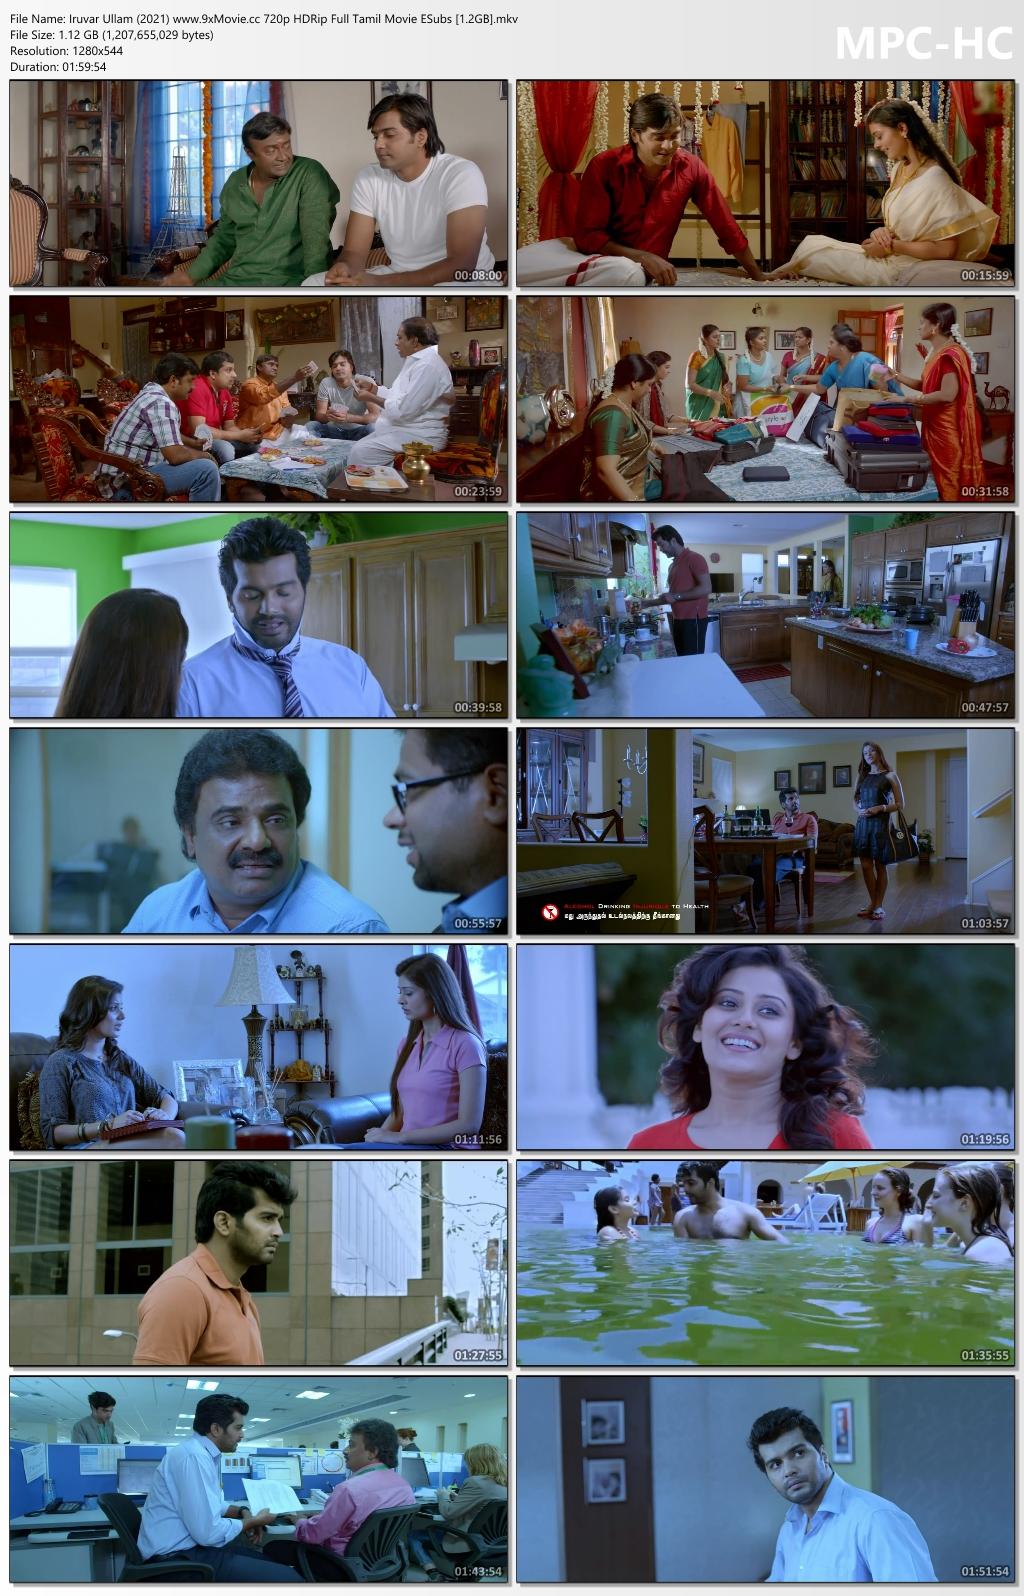 Iruvar-Ullam-2021-www-9x-Movie-cc-720p-HDRip-Full-Tamil-Movie-ESubs-1-2-GB-mkv